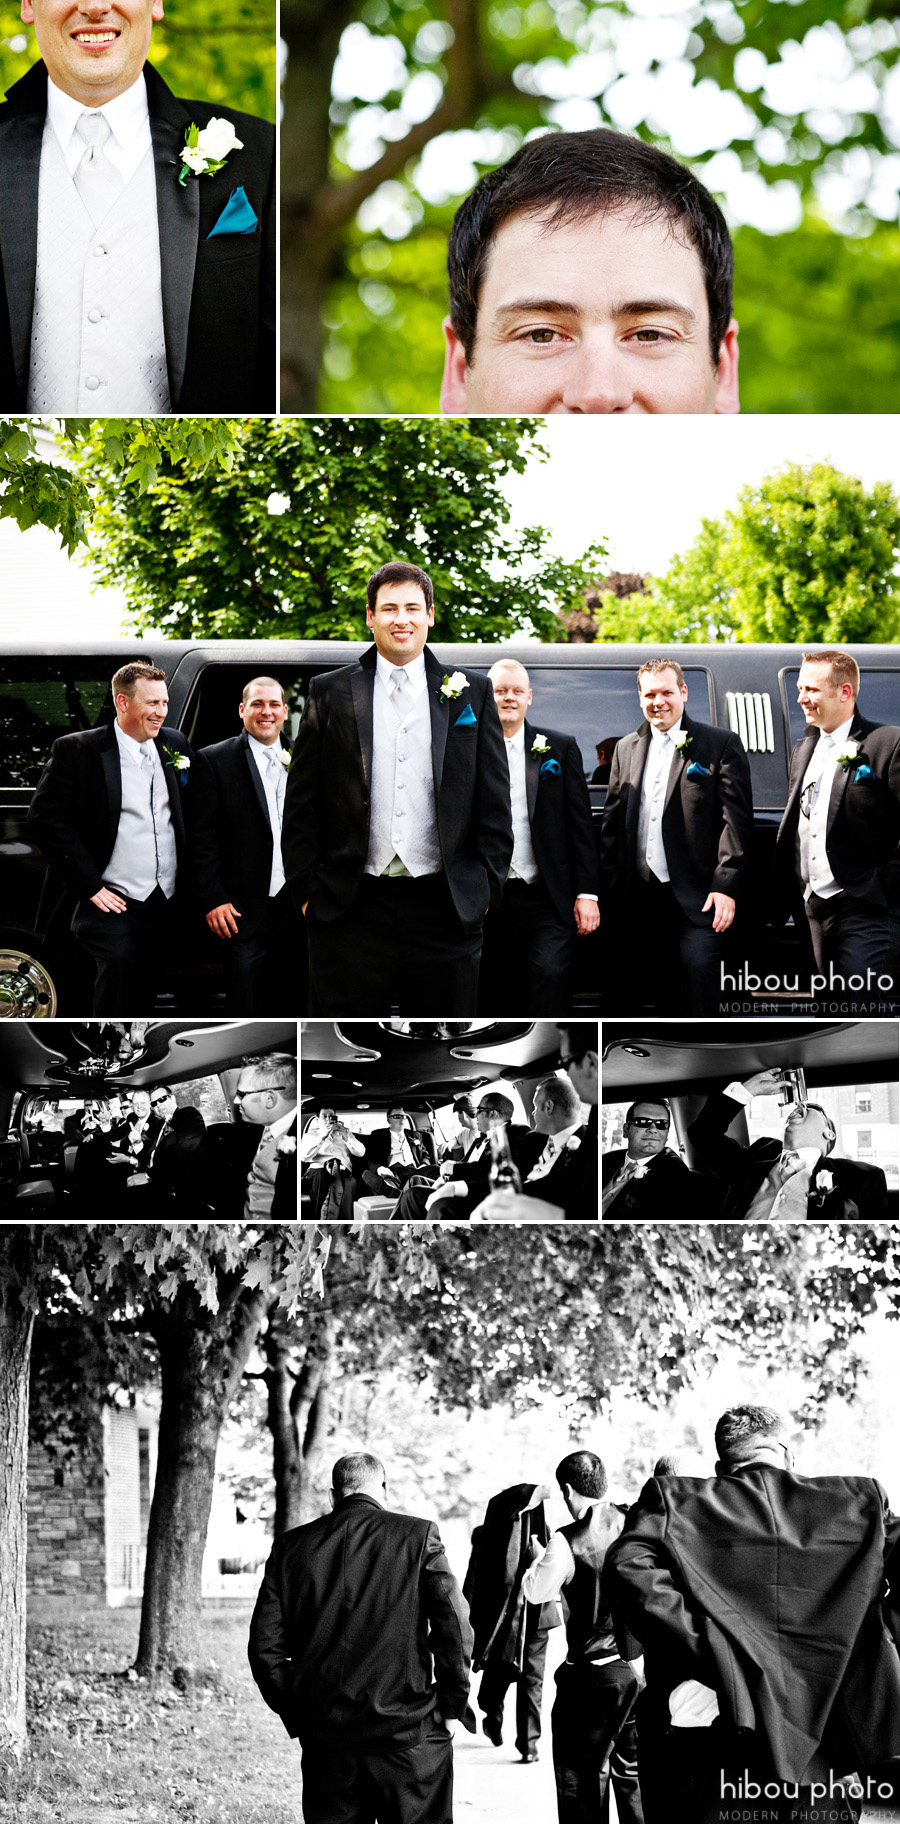 Fredericton wedding and portrait photographer hibou photo